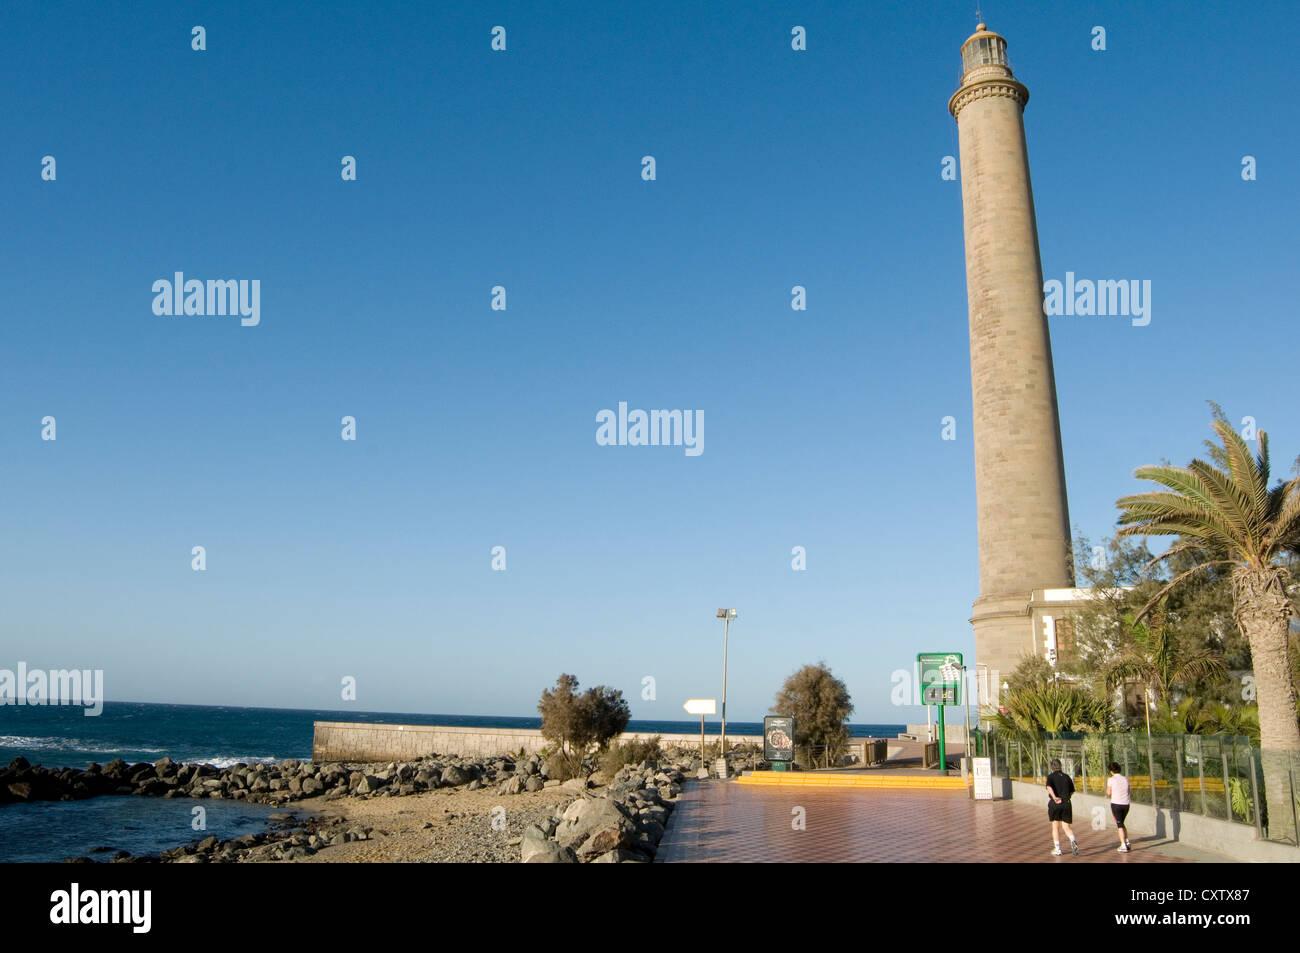 Leuchtturm El Faro Maspalomas de Gran Canaria Kanarische Inseln Inseln Spanisch Stockfoto